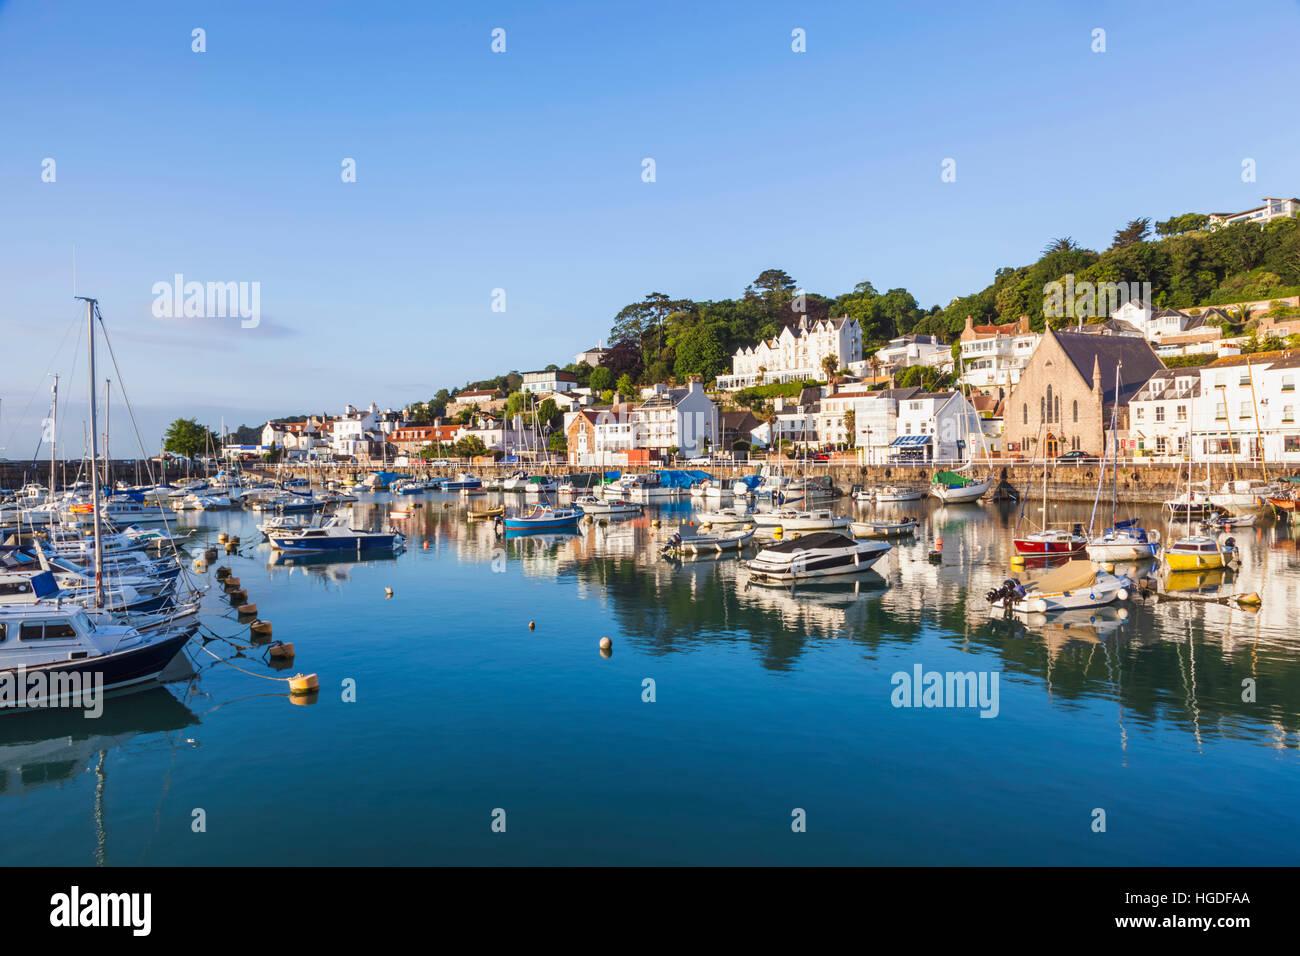 United Kingdom, Channel Islands, Jersey, St. Aubin's Harbour - Stock Image